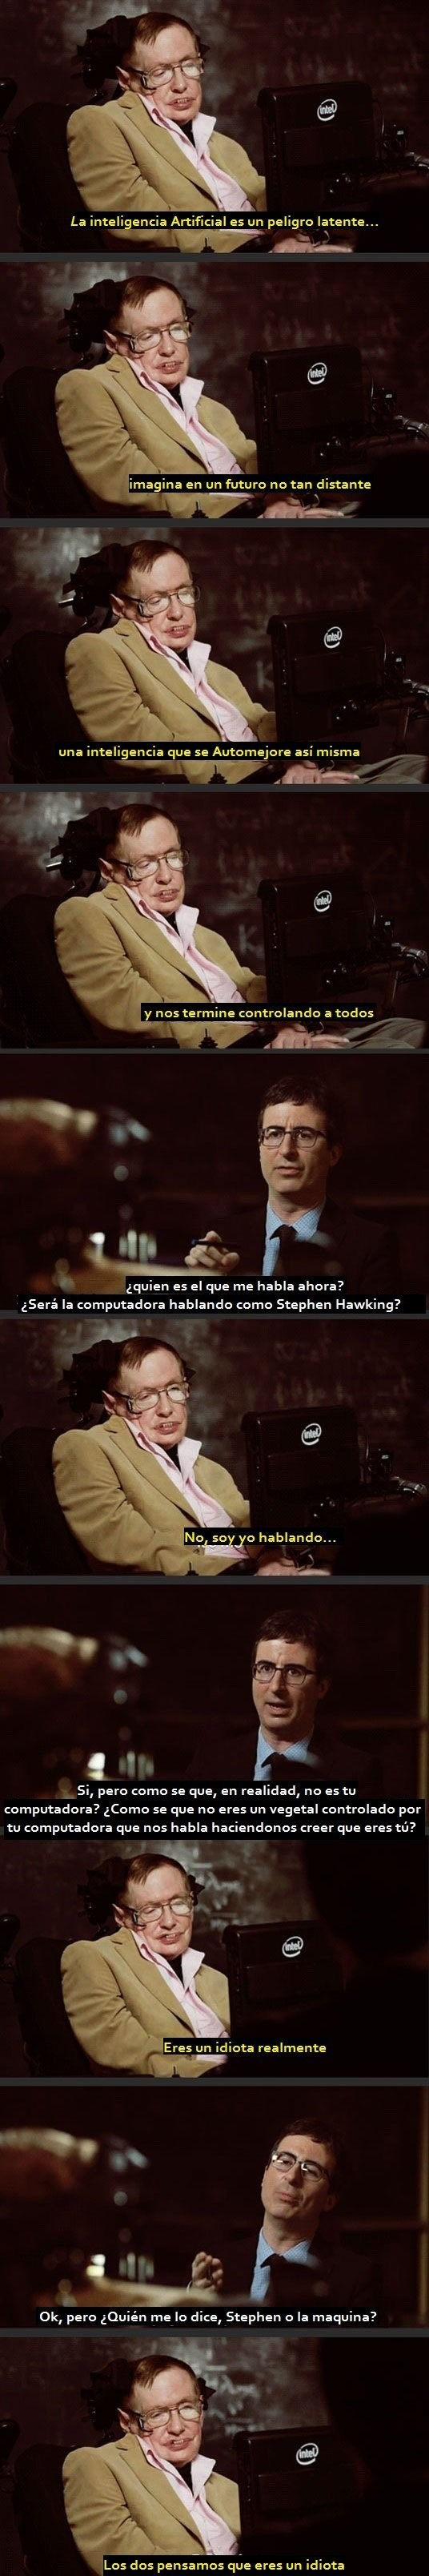 Stephen Hawking trollea a john oliver